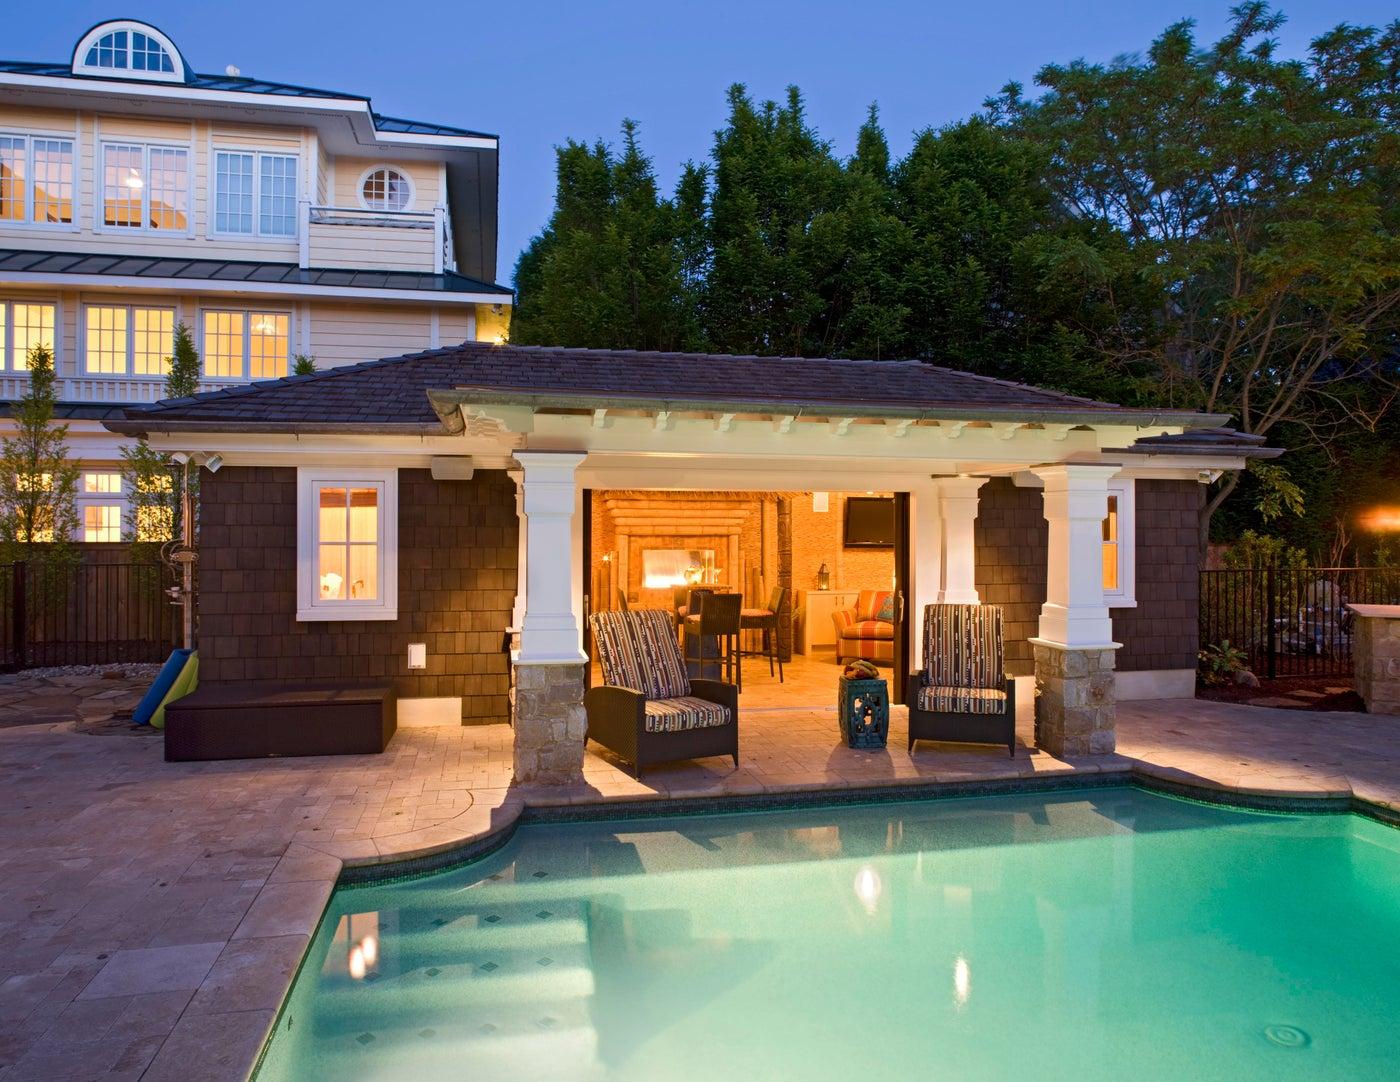 Beach House II Exterior Pool Deck